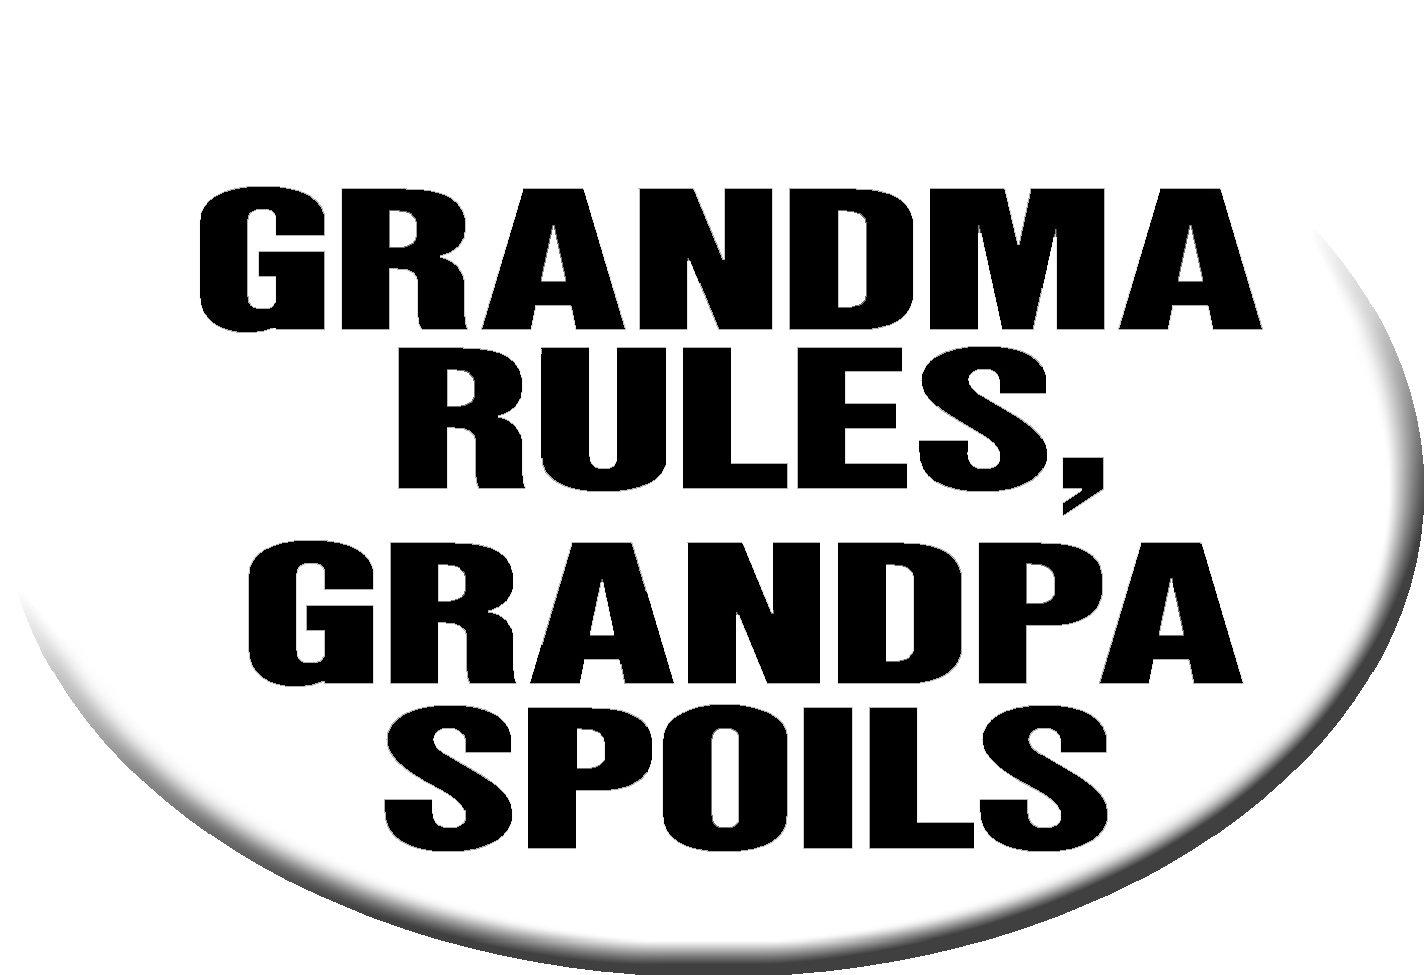 Grandpa Spoils Hitch Cover Grandpa Spoils/' Hitch Cover Knockout 247 Grandma Rules